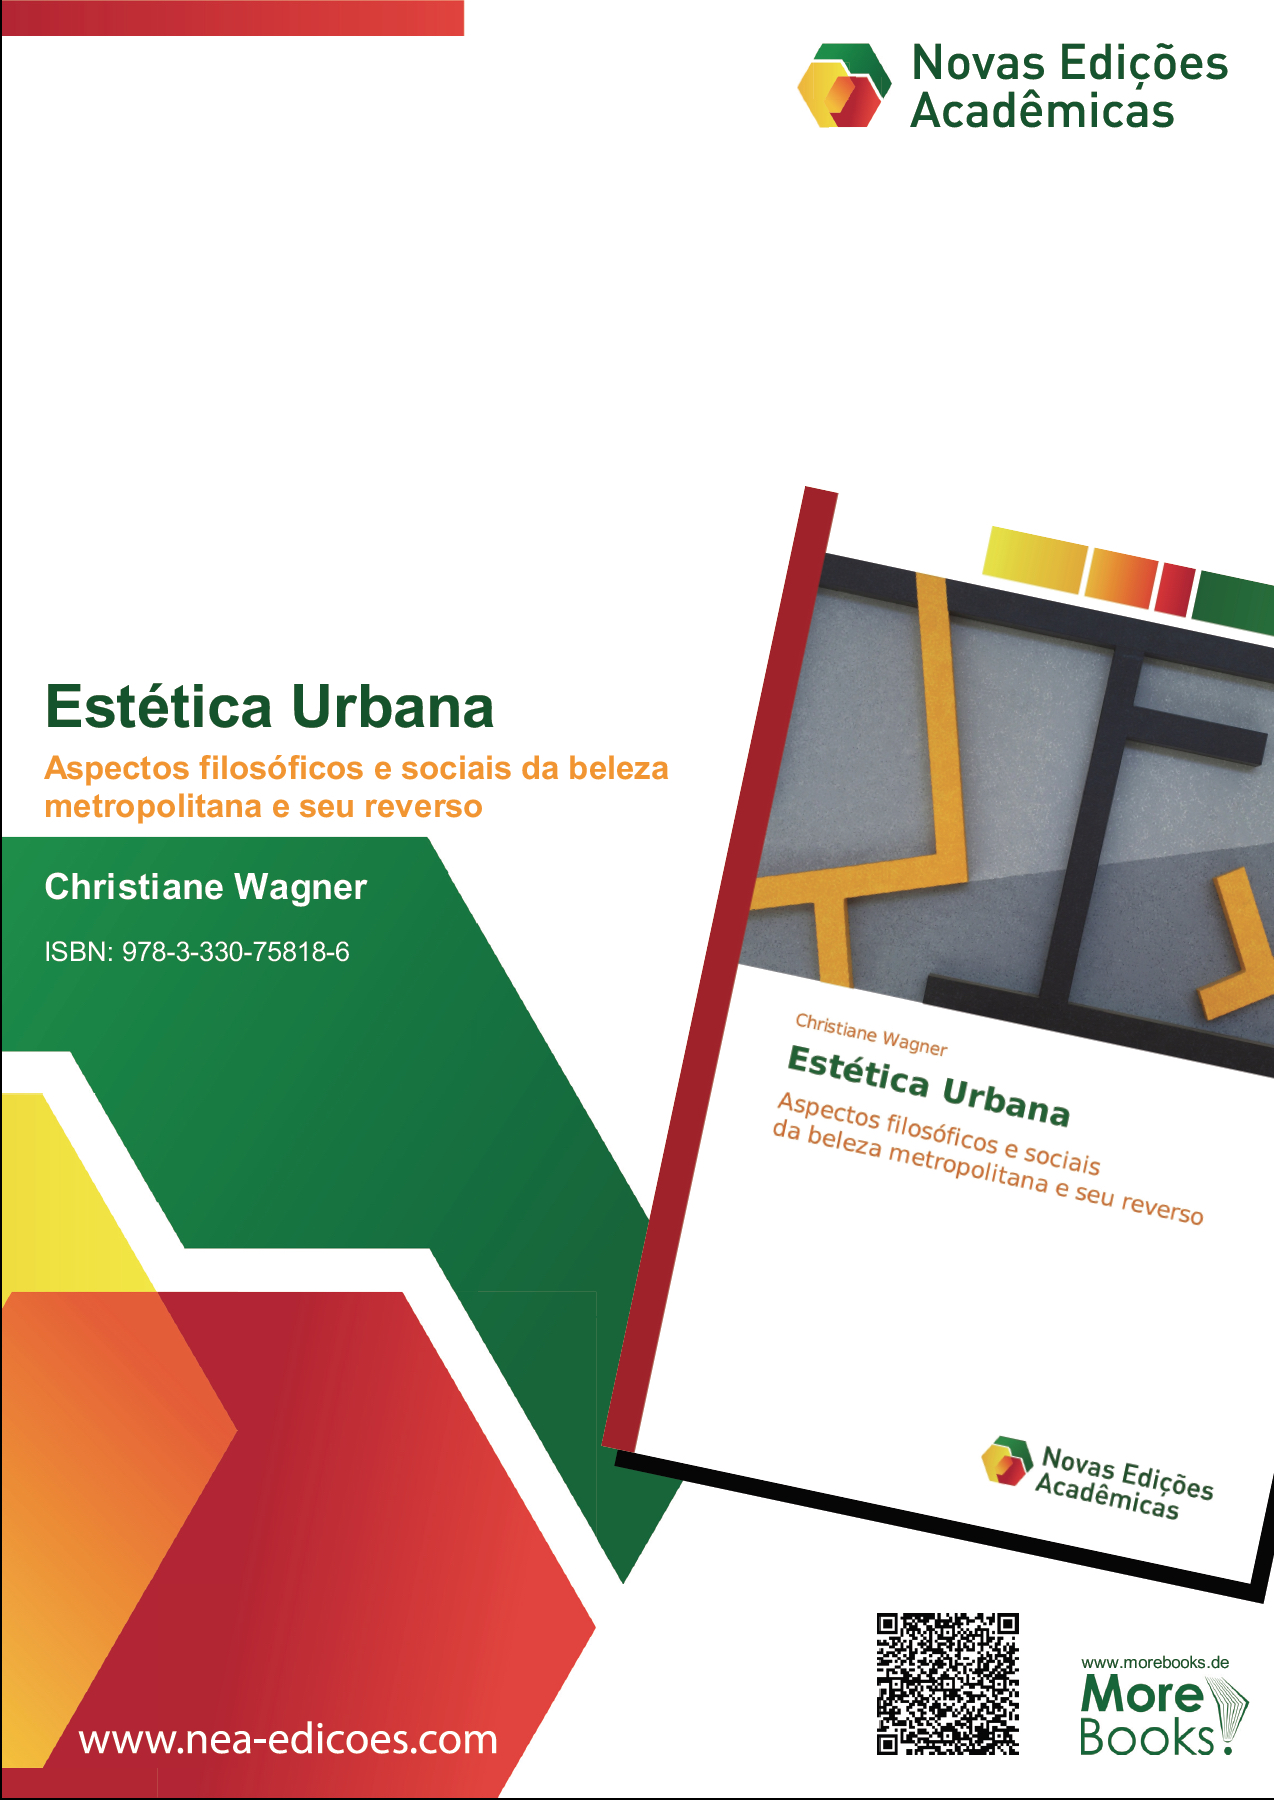 Estética Urbana_Poster_Marketing